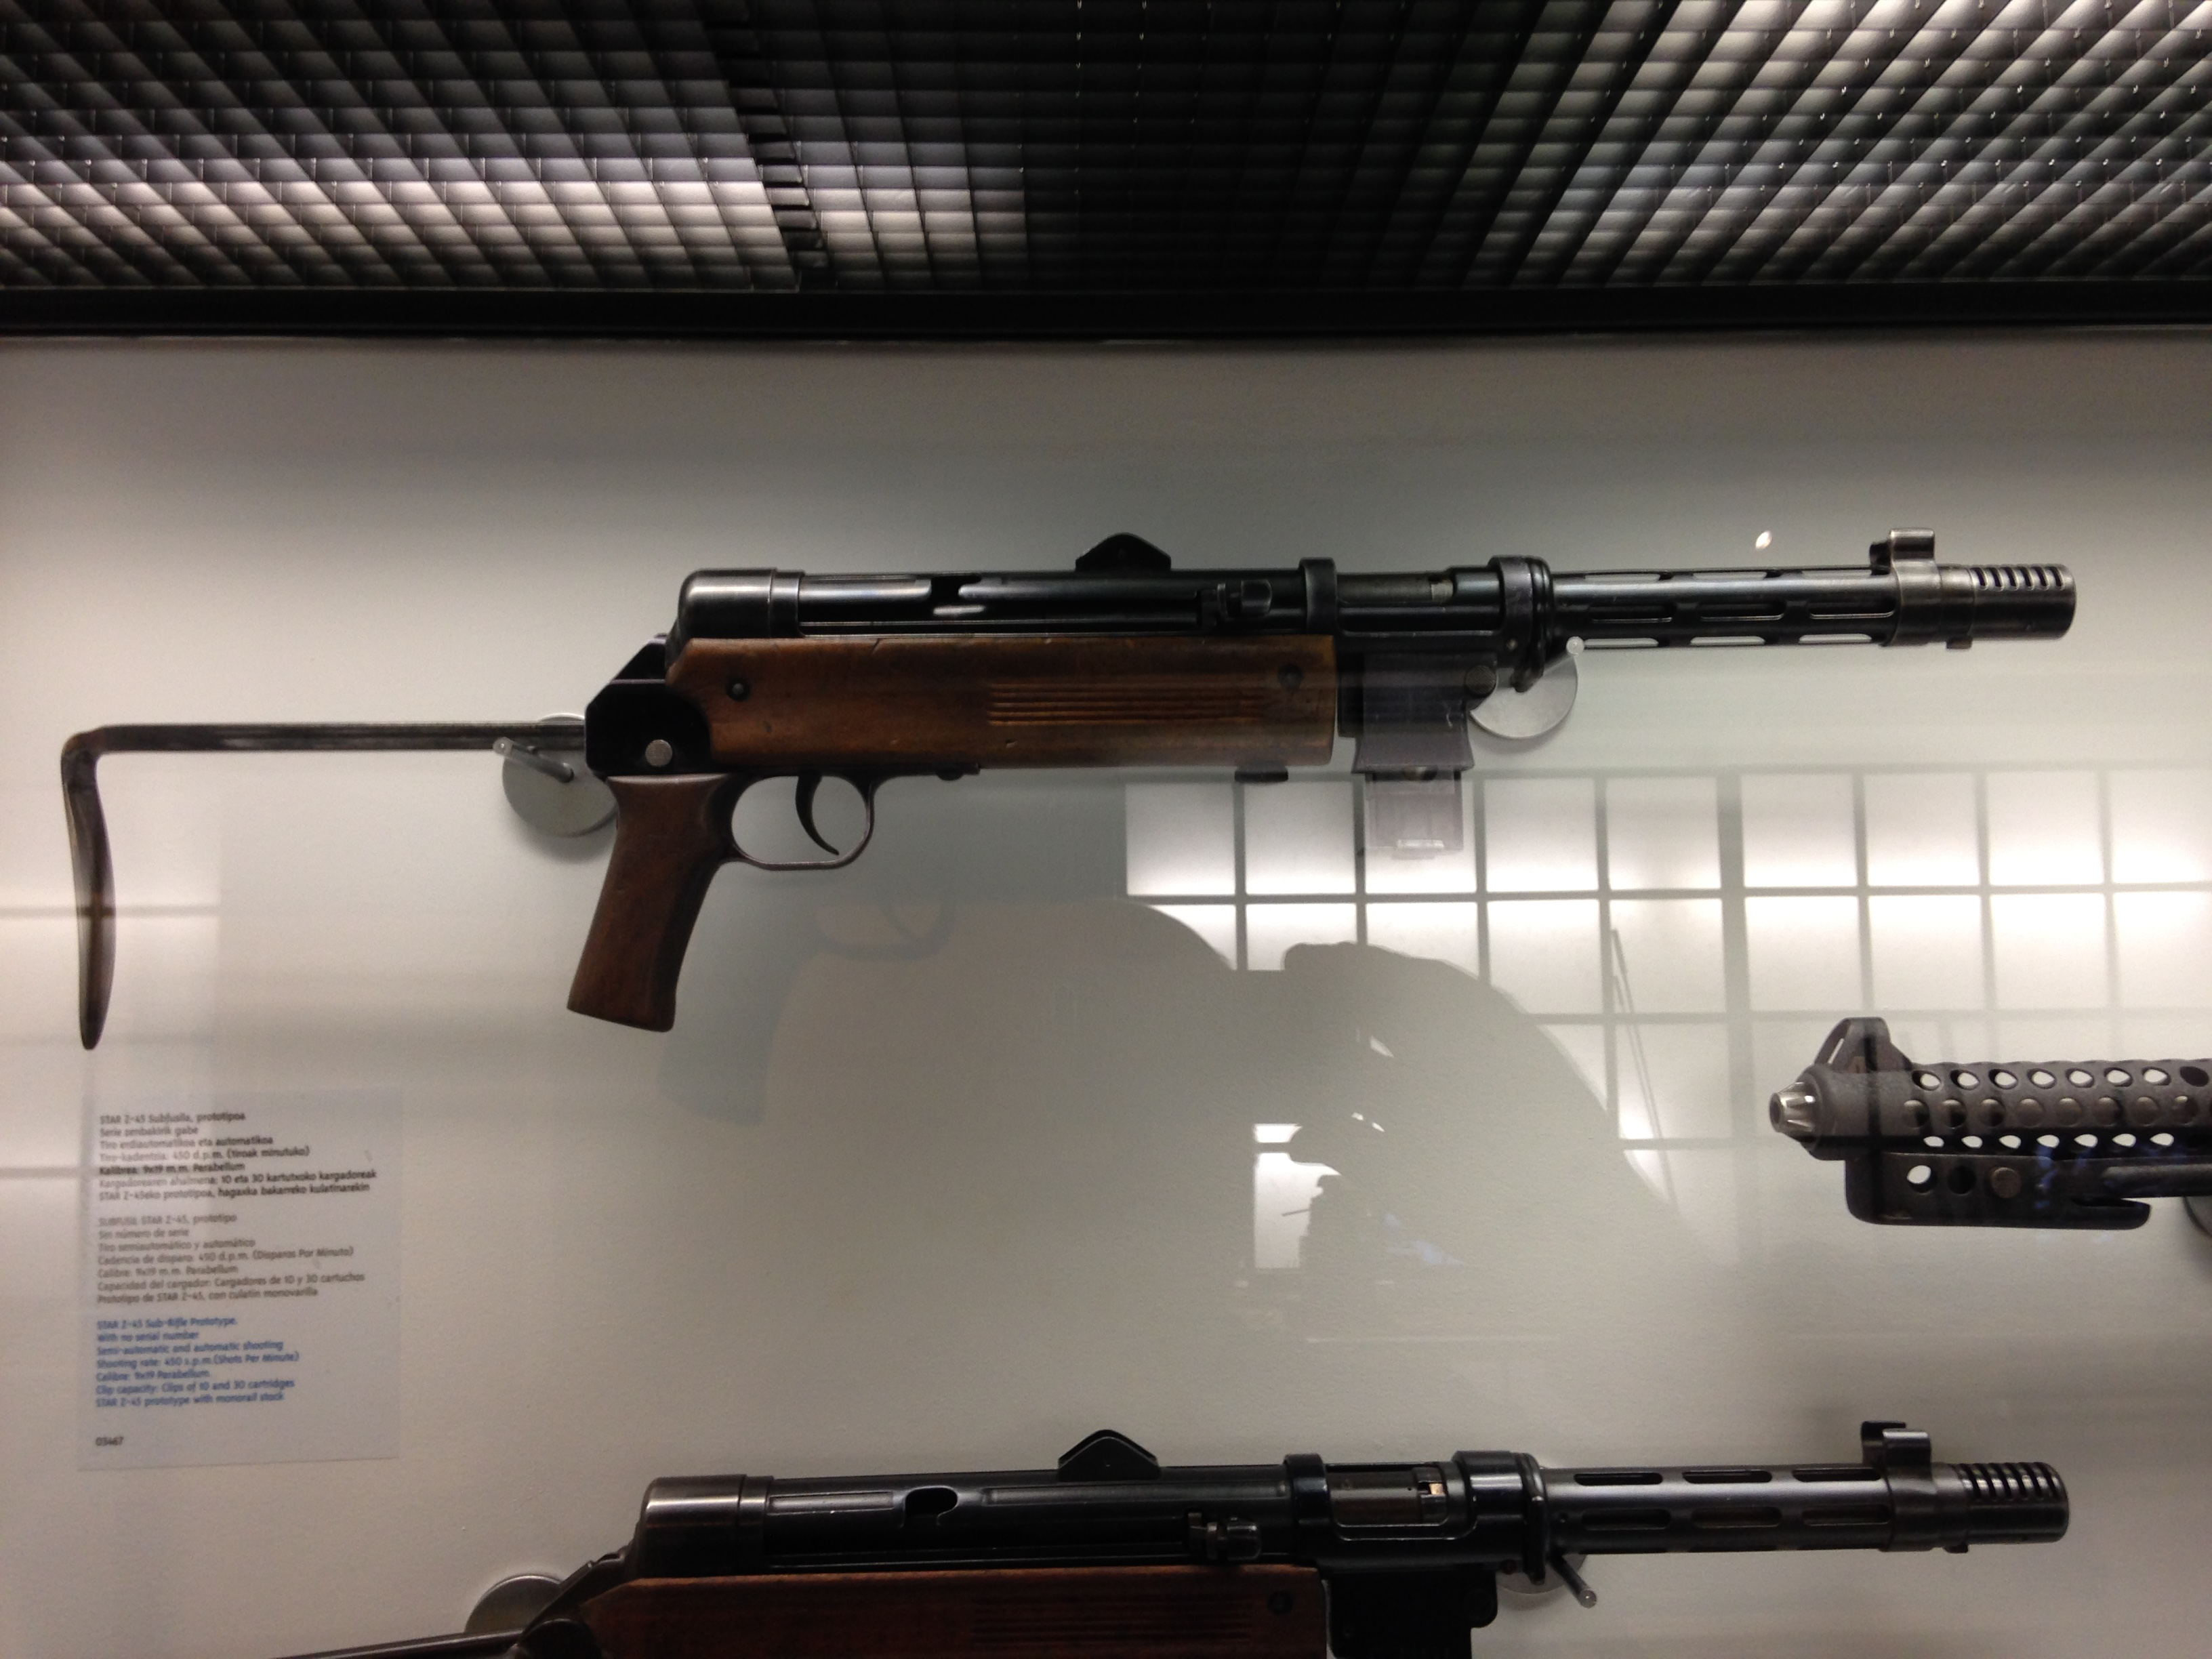 File:Museo Eibar Subfusil Z-45 STAR 2 JPG - Wikimedia Commons